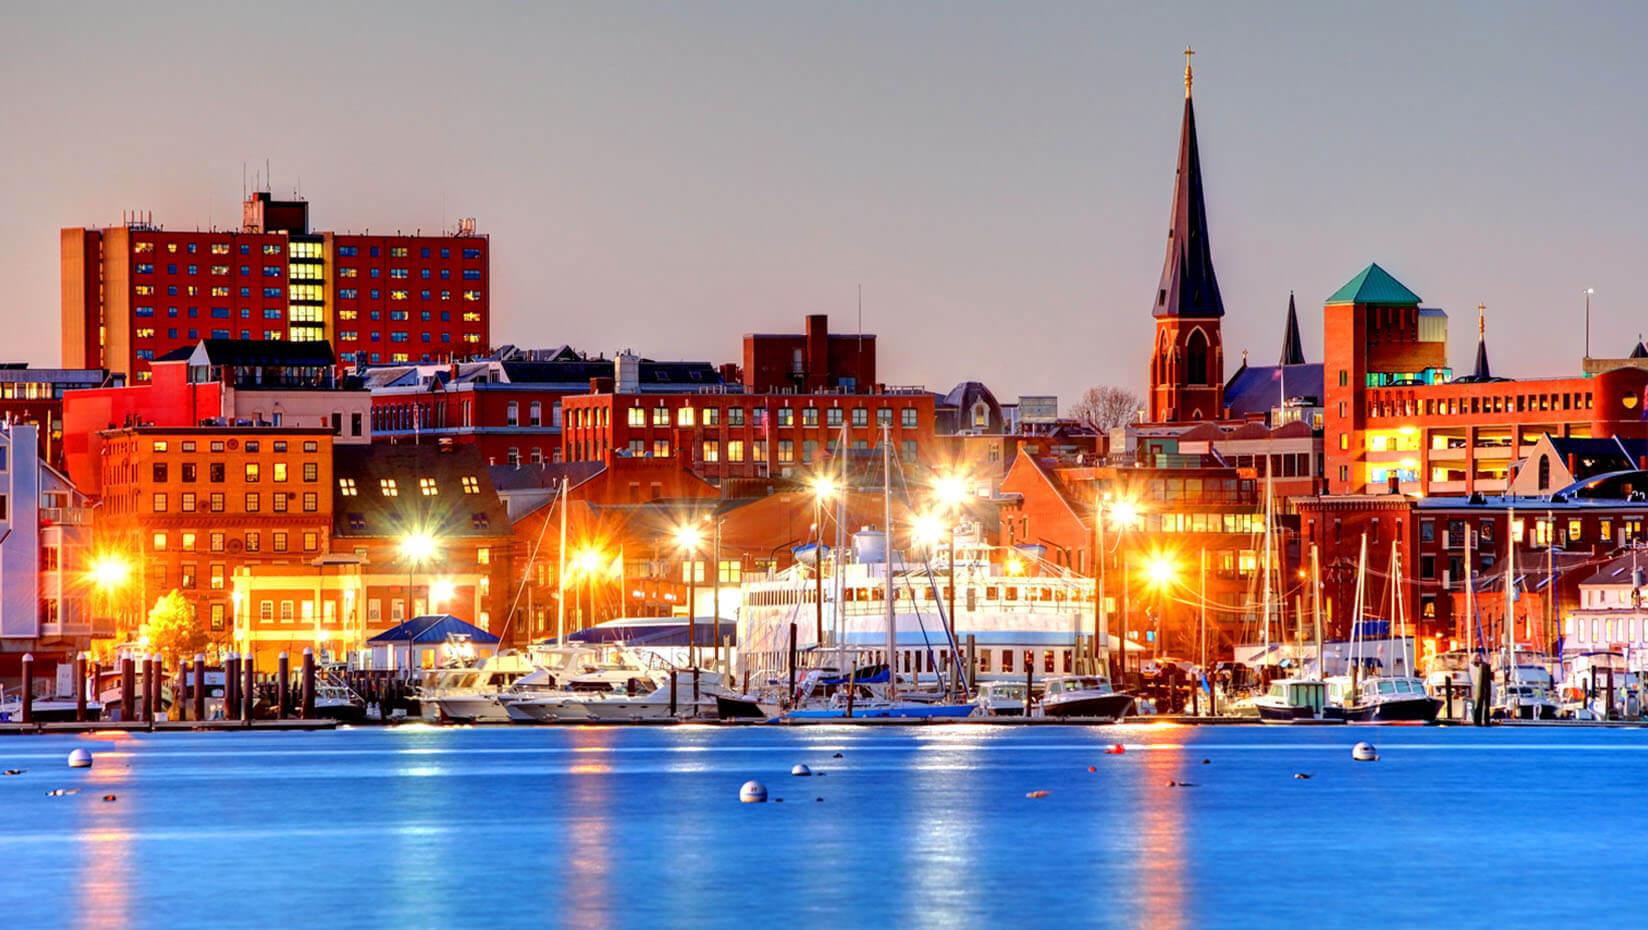 University of Maine awarded $700K to host 2021 National NSF EPSCoR